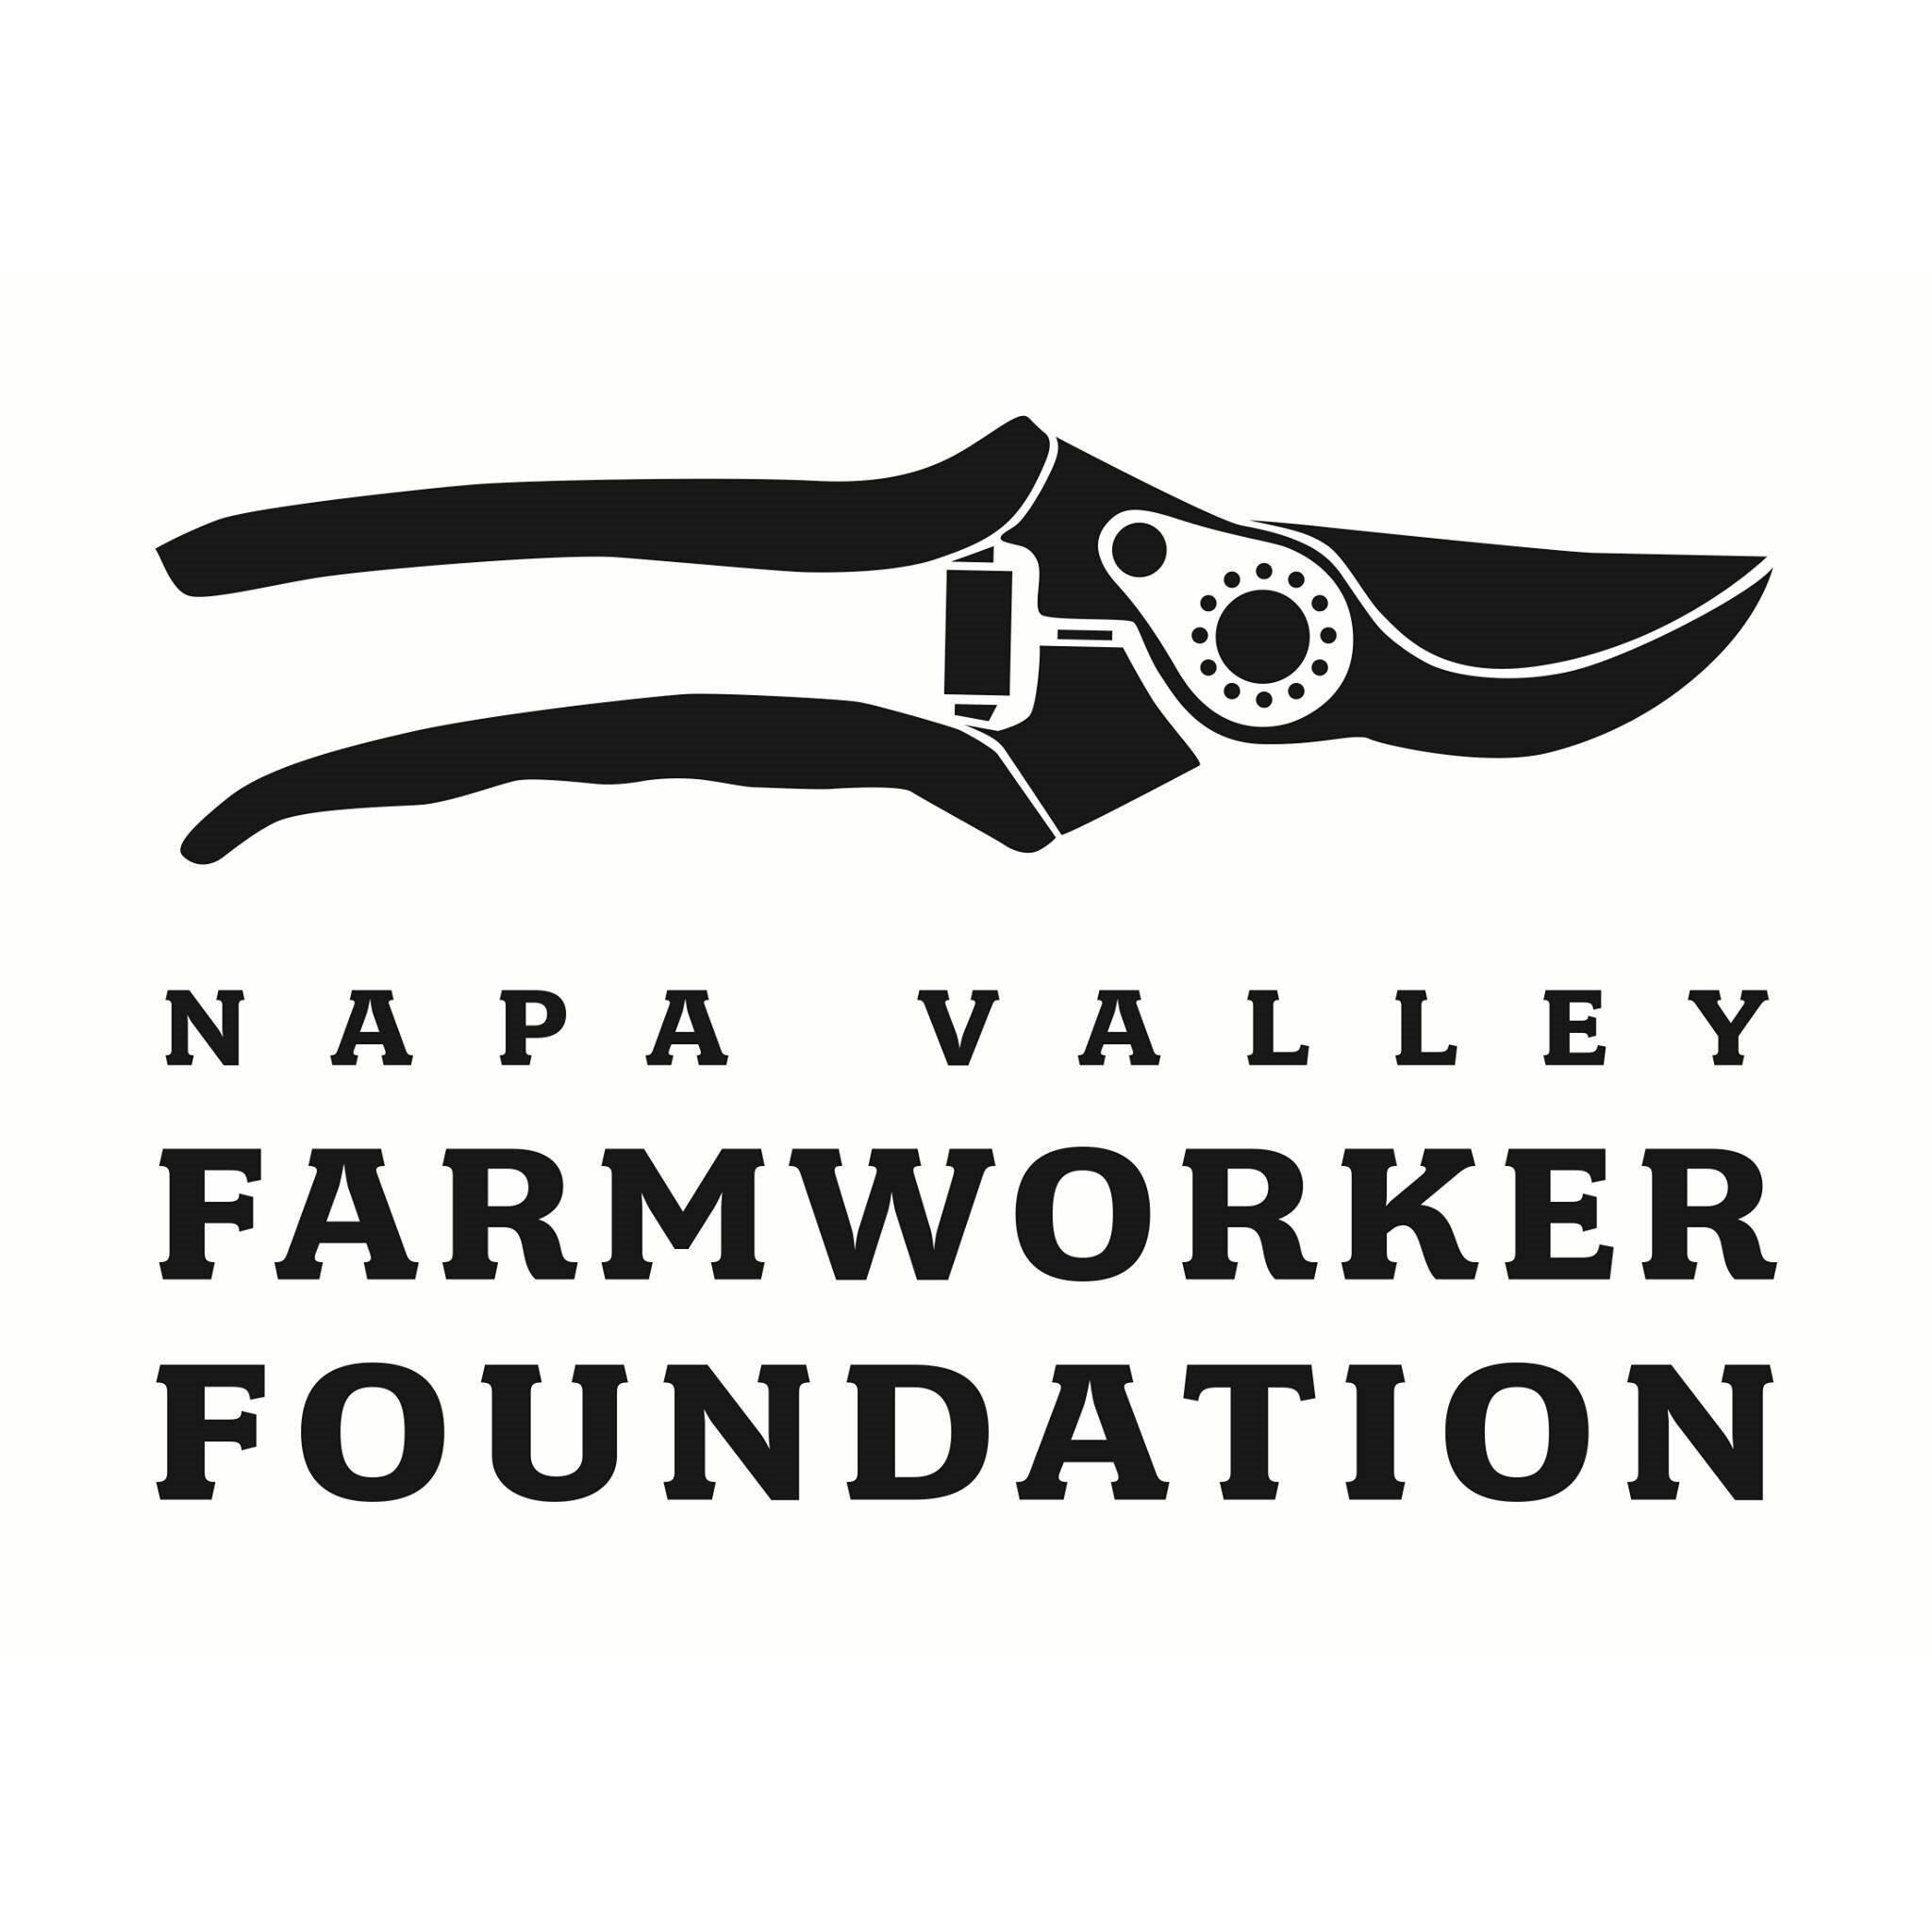 Napa Valley Farmworker Foundation Logo - NEW (2).jpg